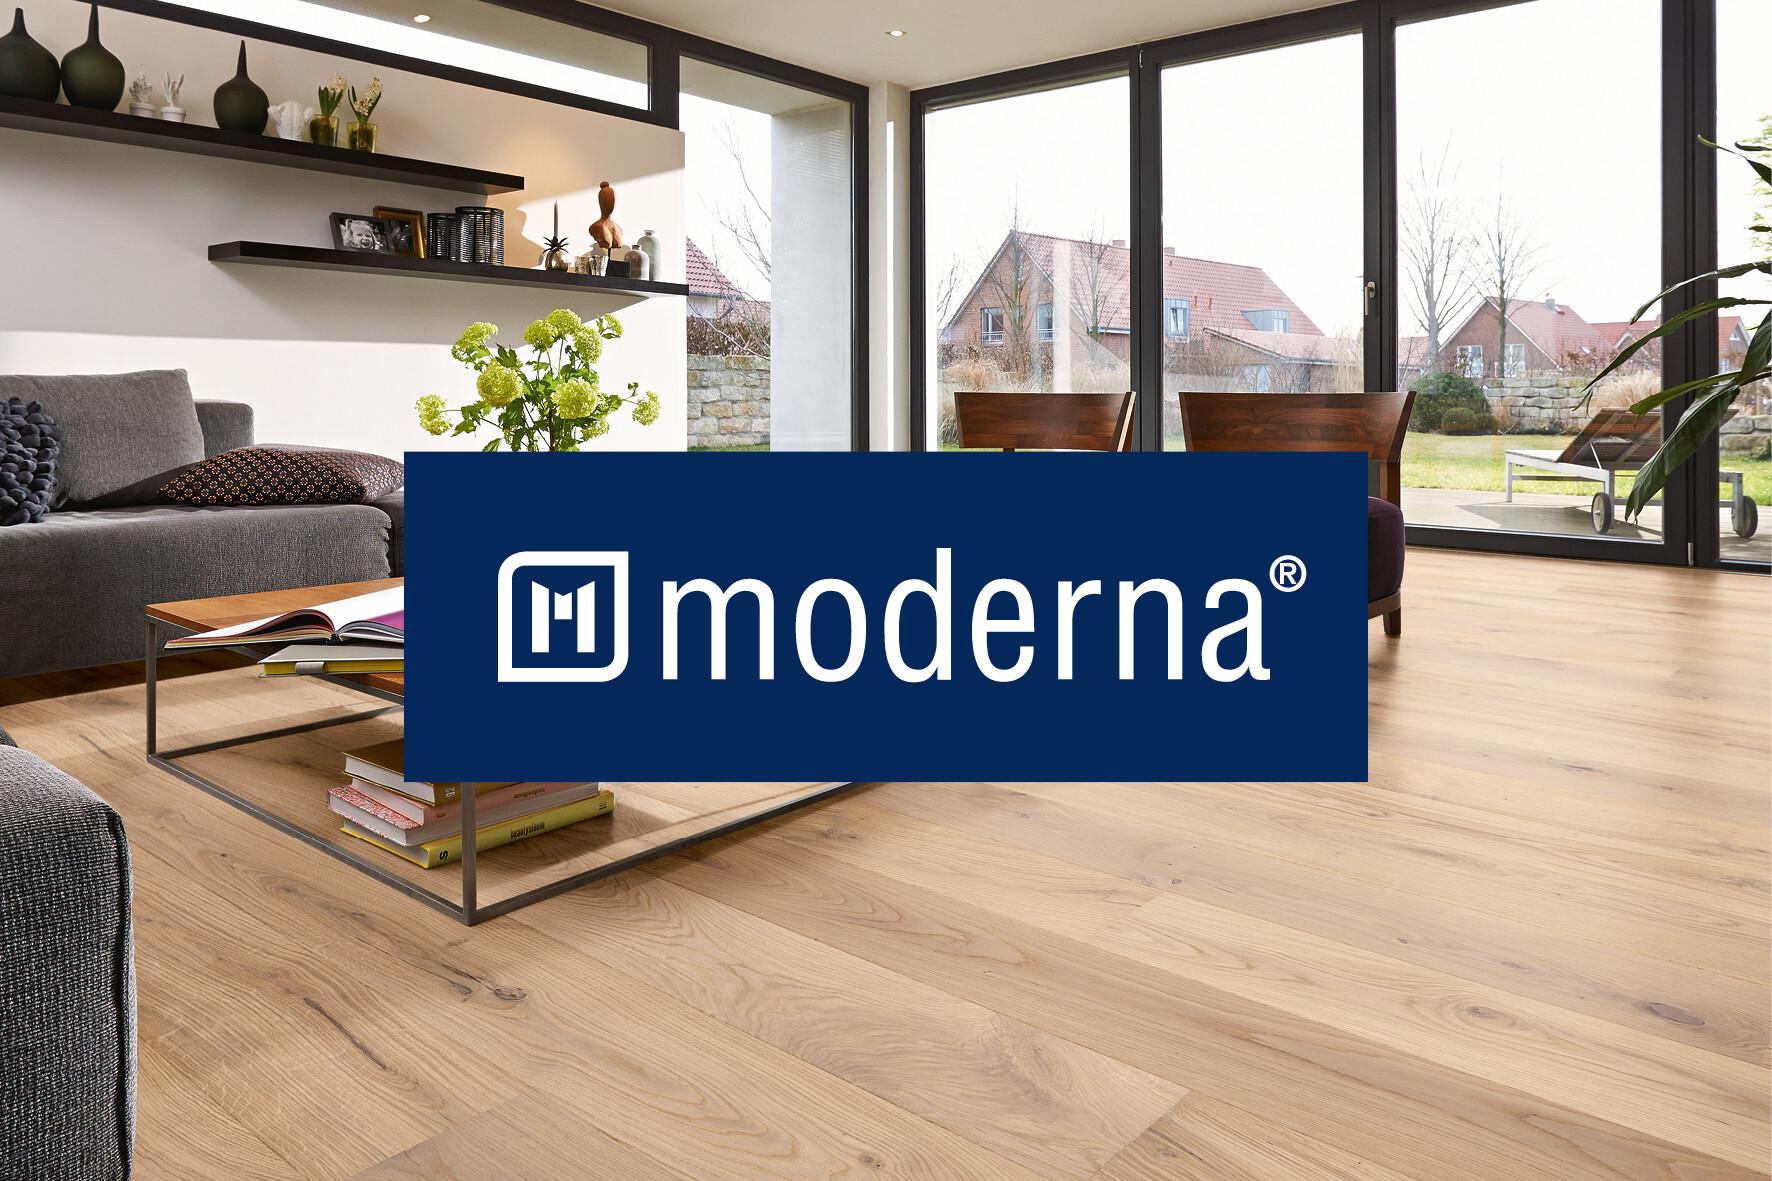 Marke moderna